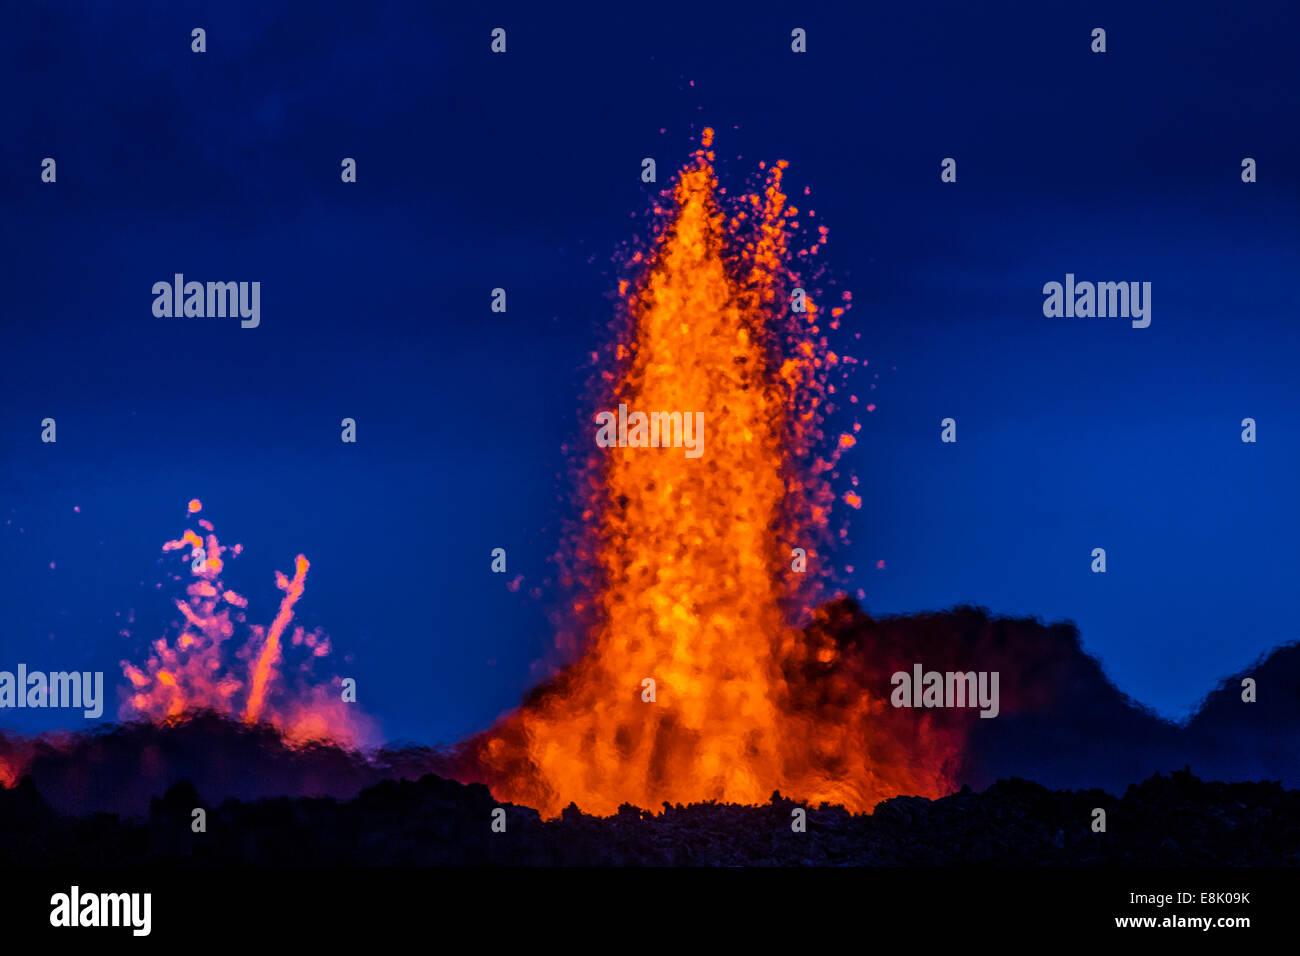 Lava fountains at the Holuhraun Fissure eruption near Bardarbunga Volcano, Iceland. - Stock Image